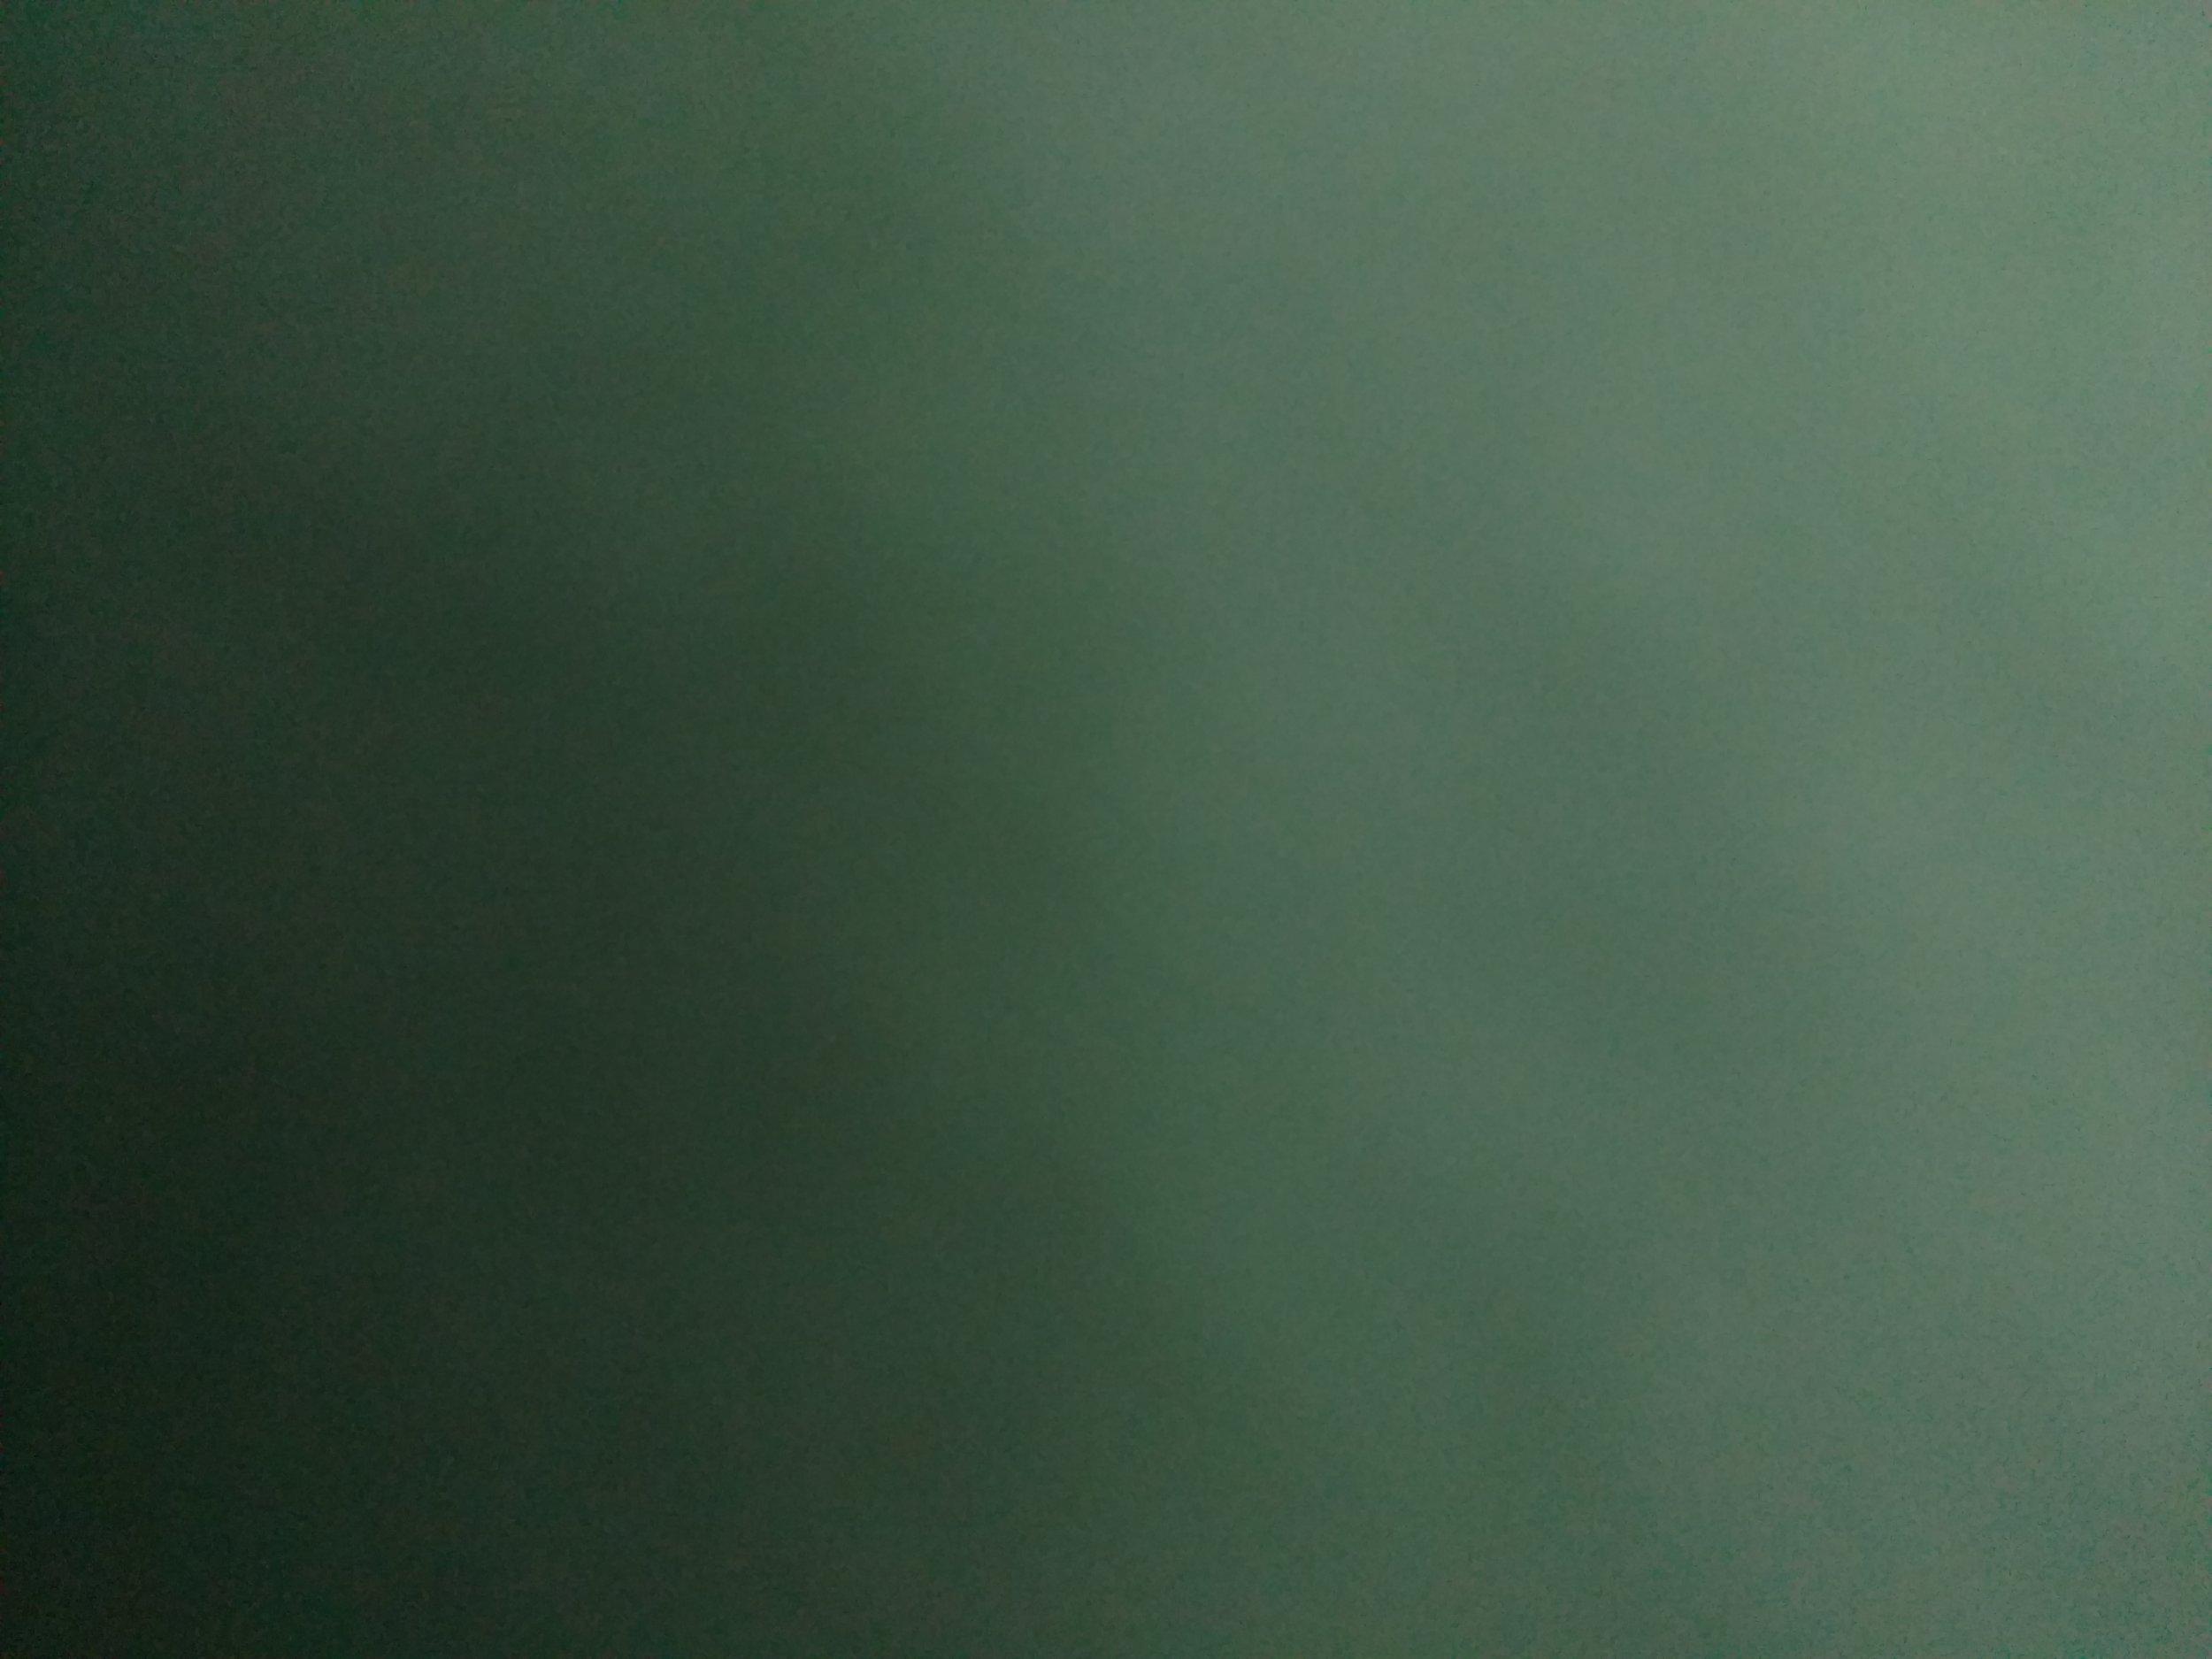 willroth-co-free-texture-gradient-039.jpg